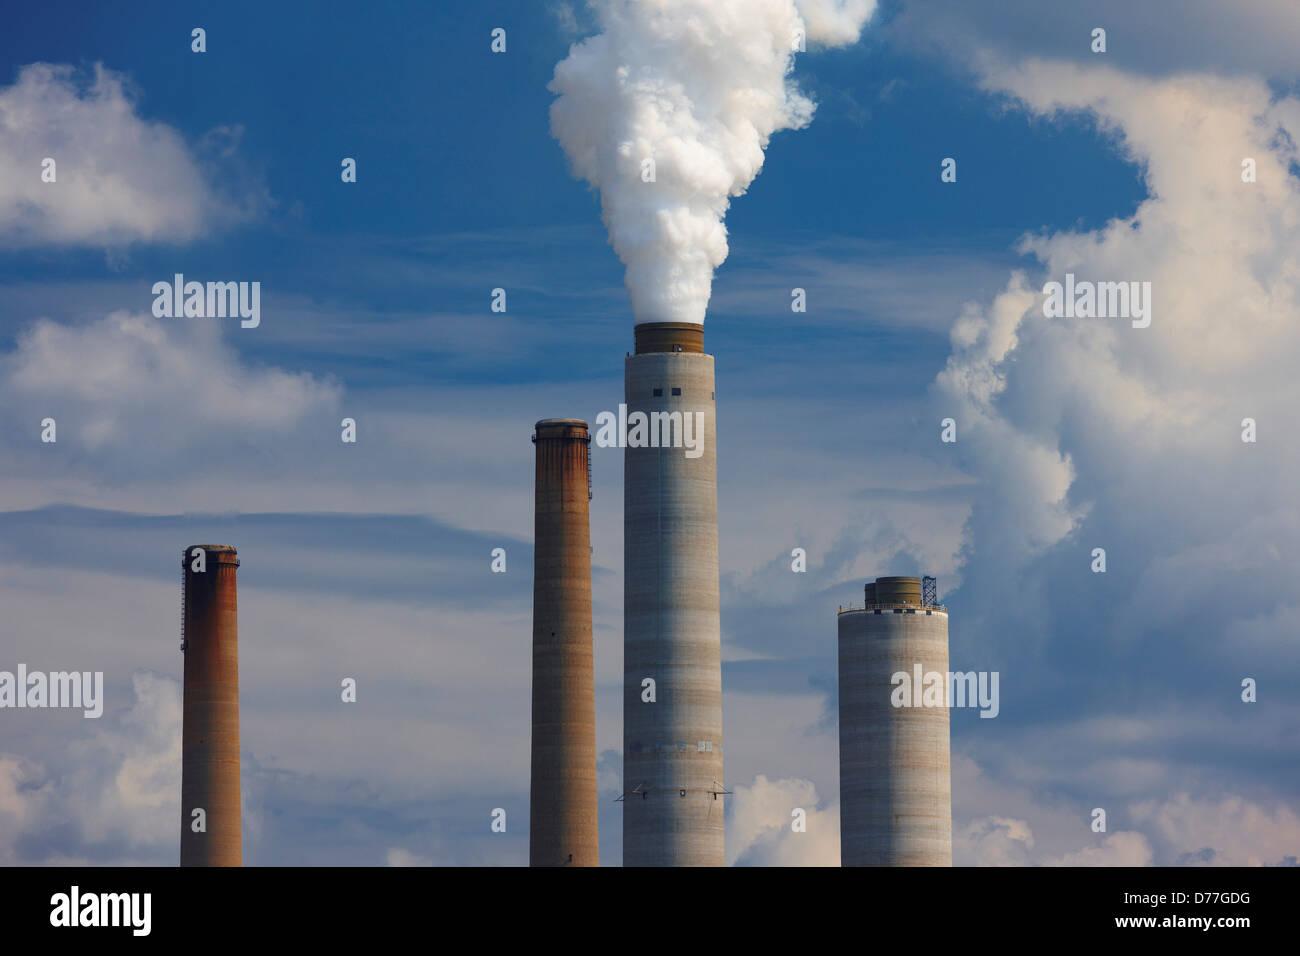 USA West Virginia Poca Smokestacks John E. Amos coal fired power plant - Stock Image